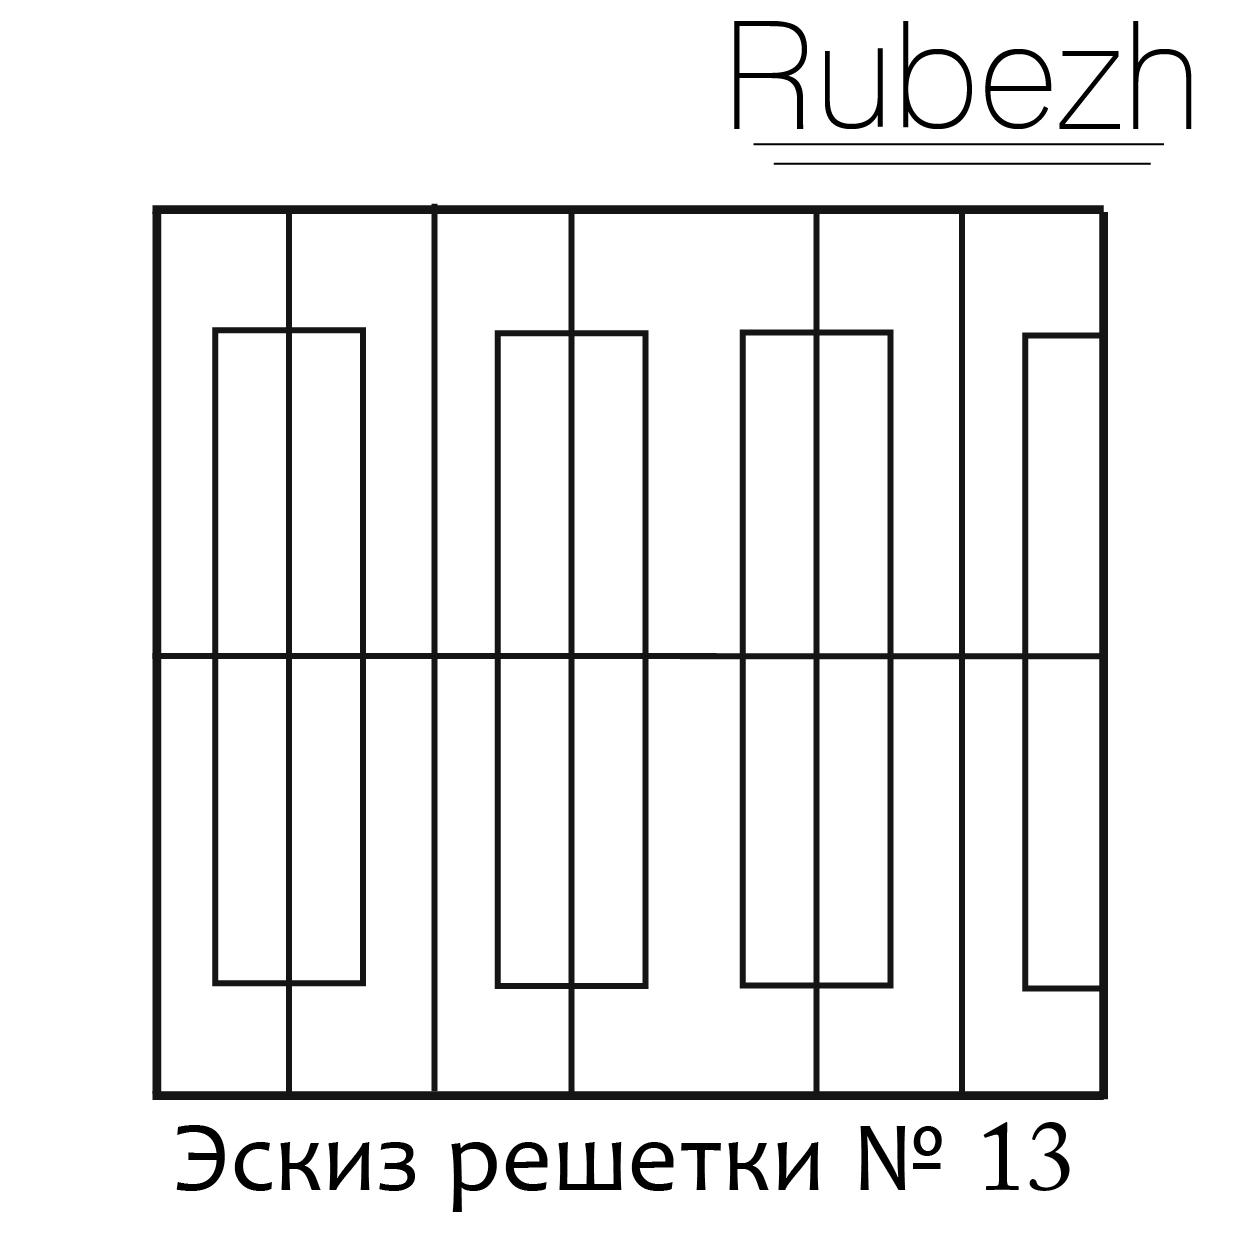 Эскиз решетки № 13